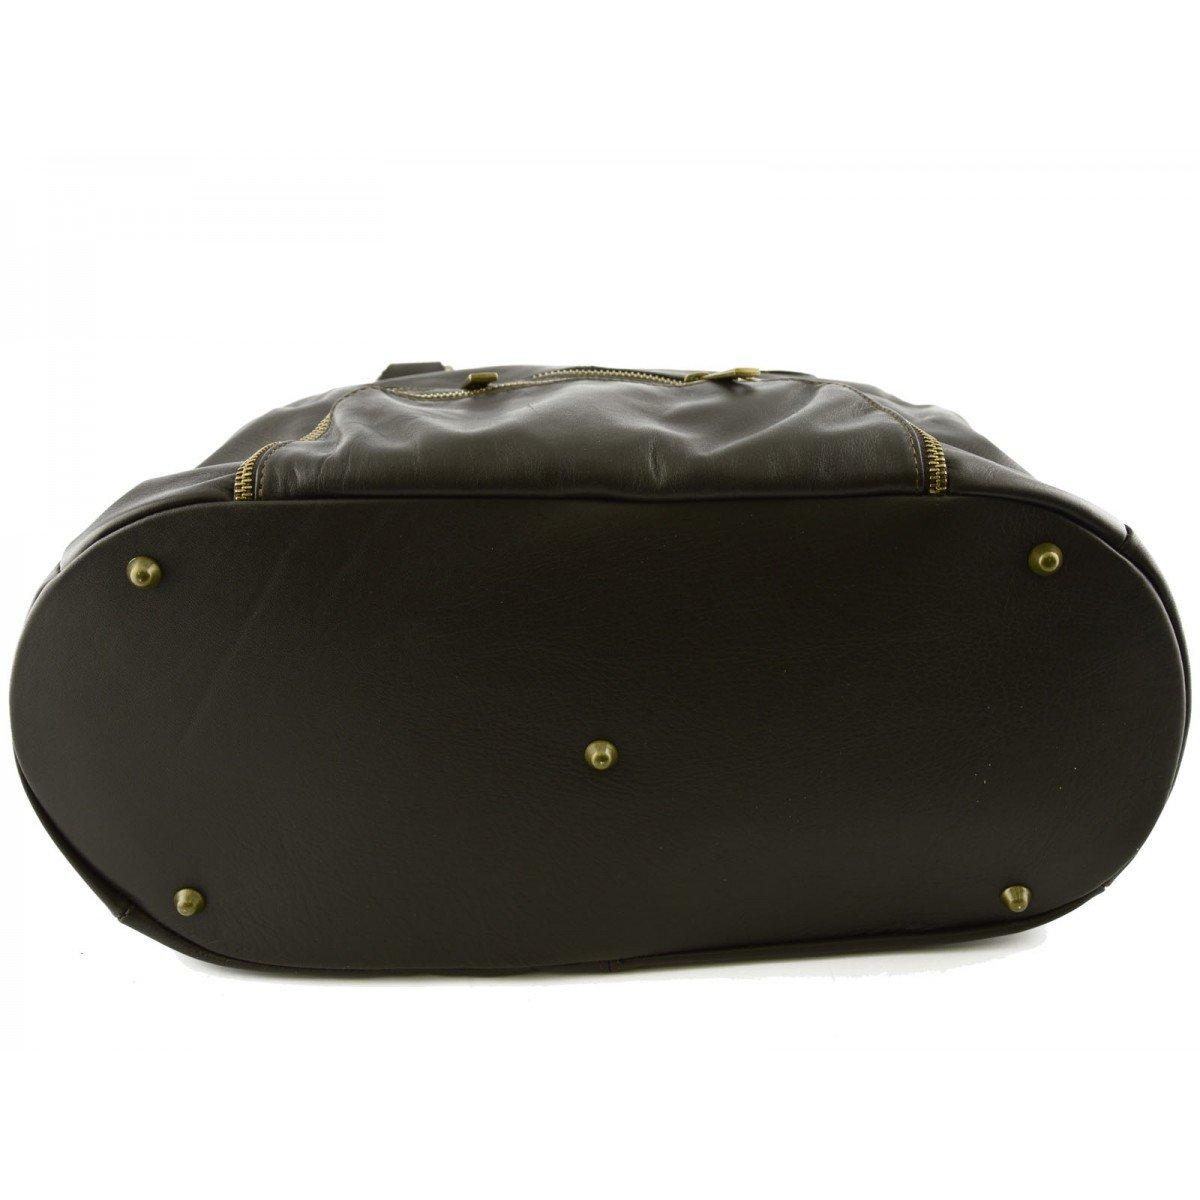 Genuine Leather Woman Handbag Color Dark Brown